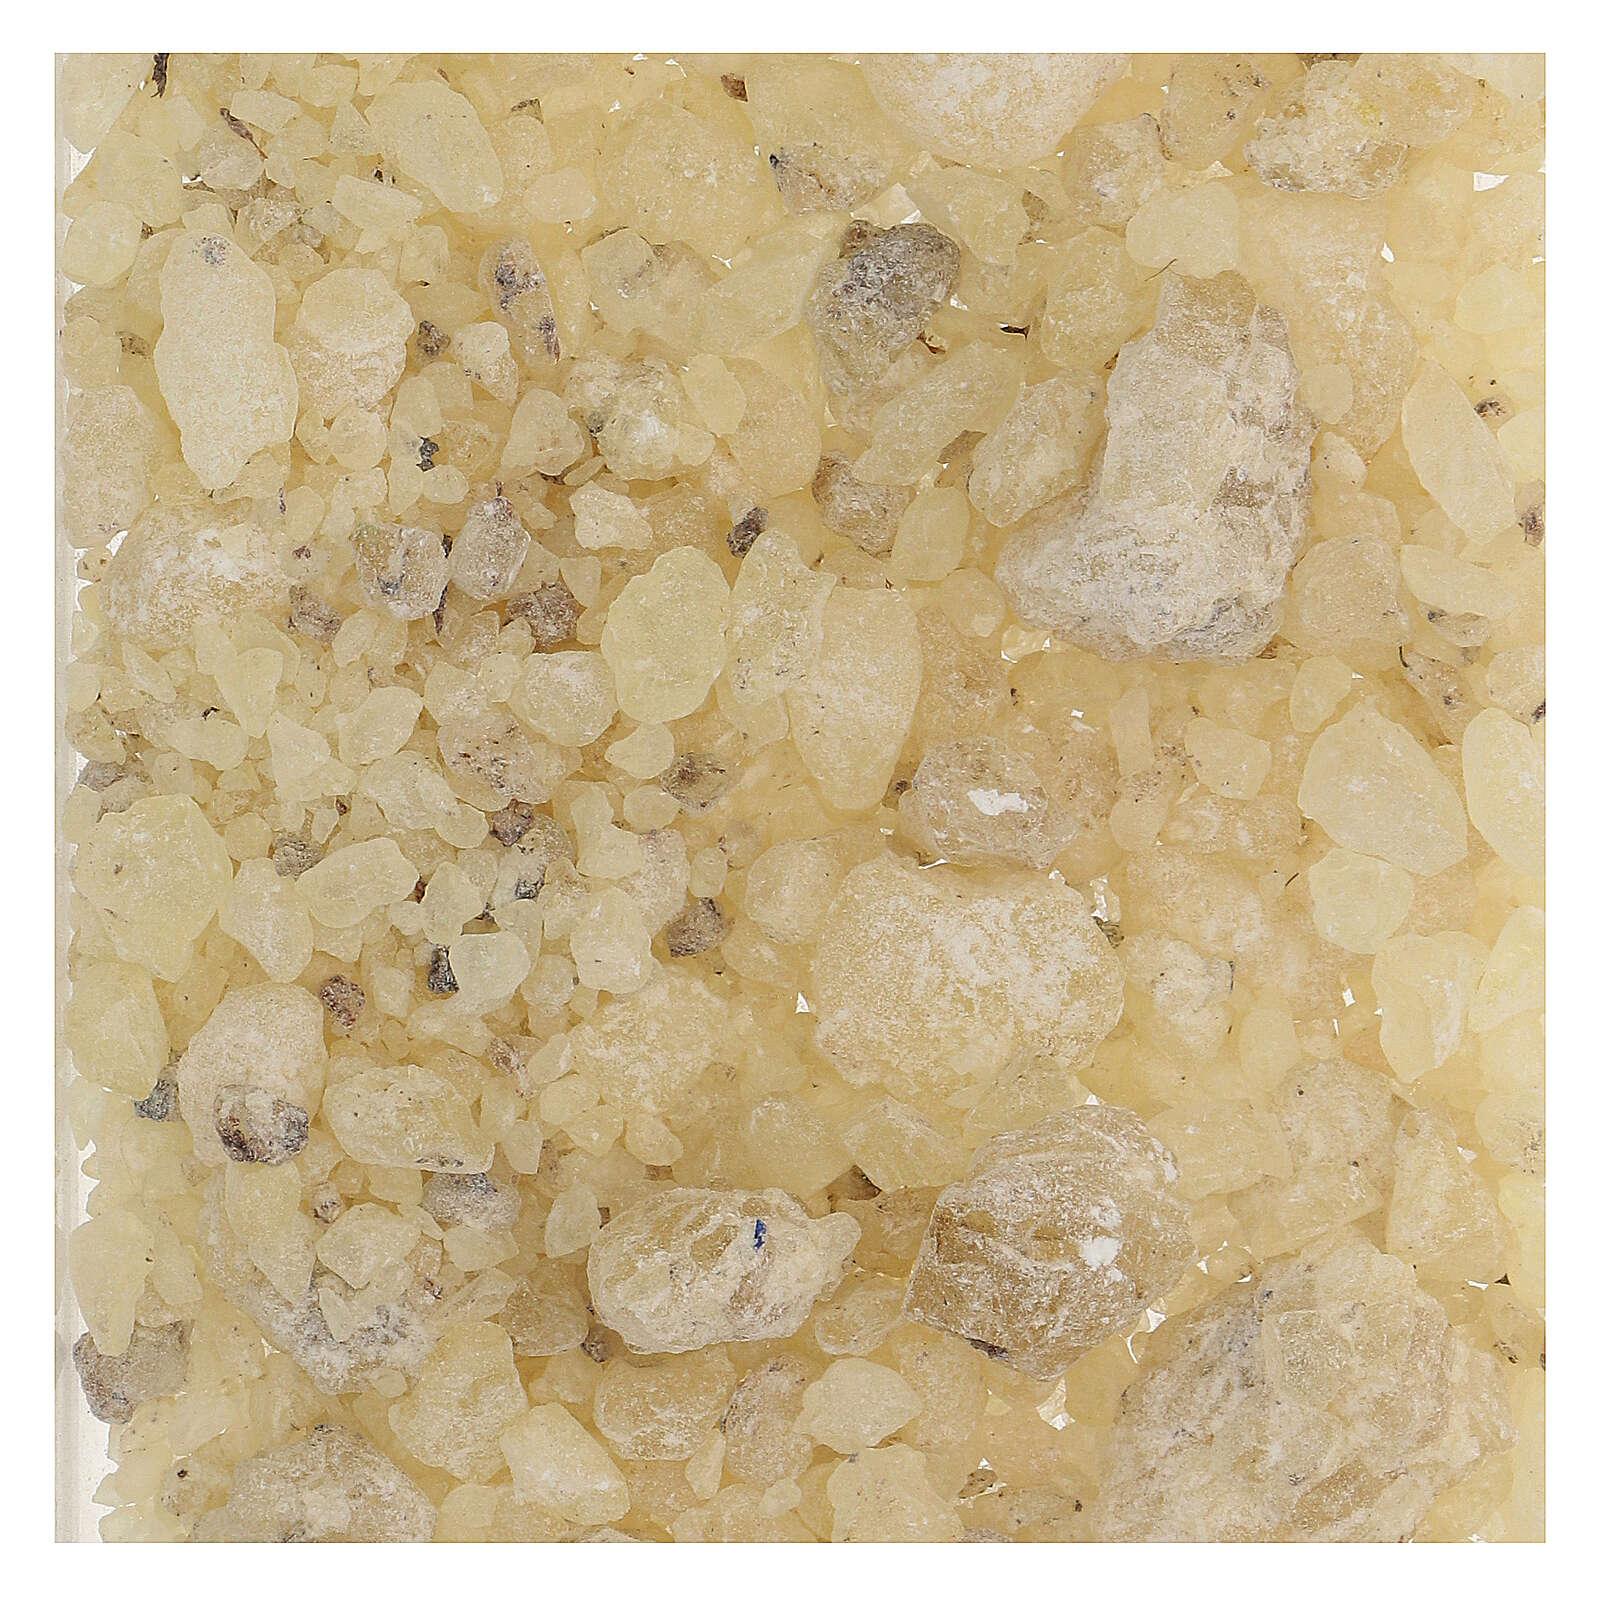 Amostra 10 gr de incenso Drammar ref. CO000278 3